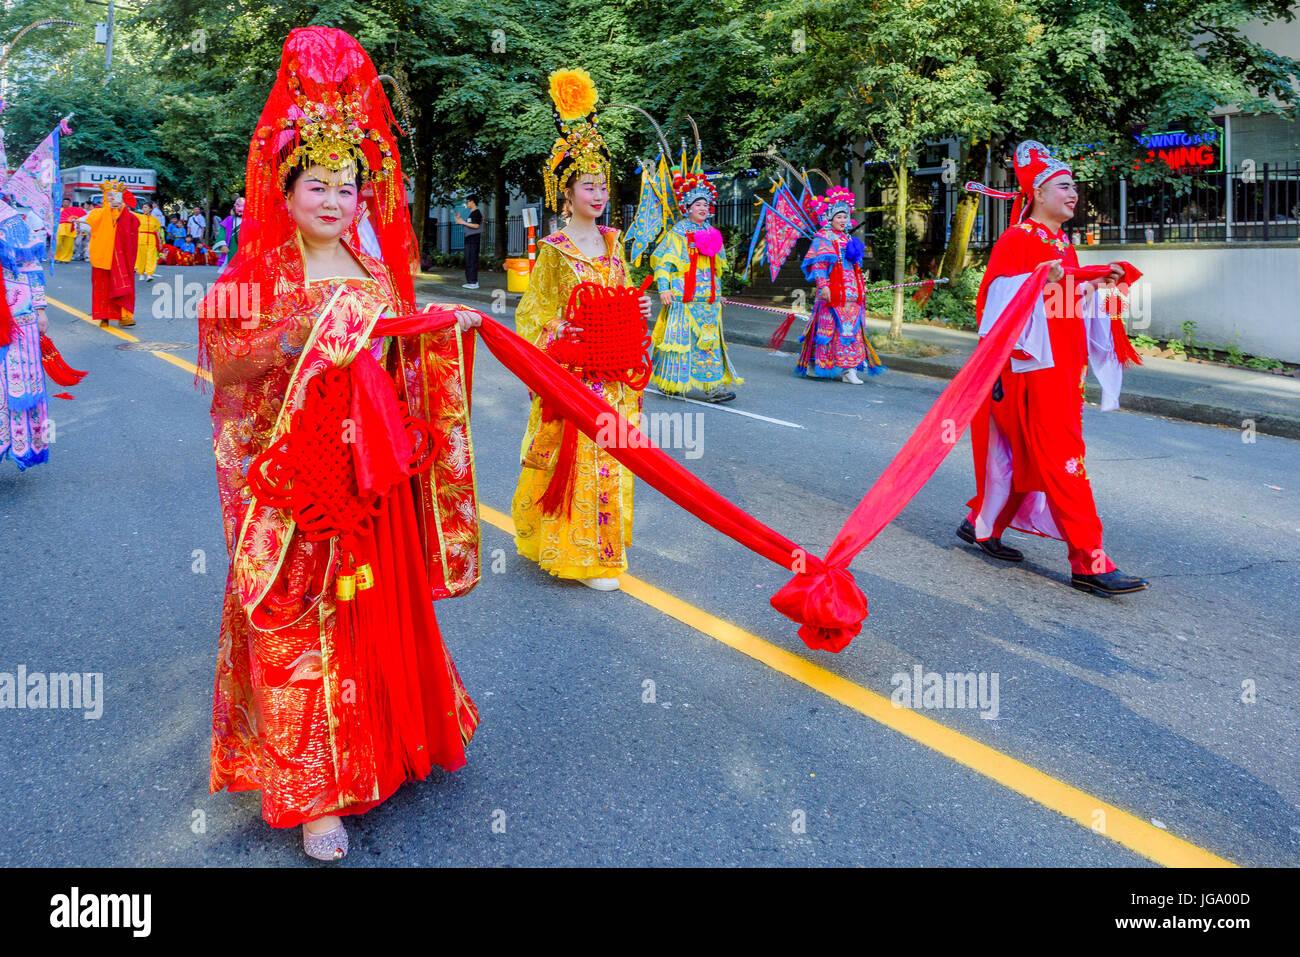 Chinese Opera celebrates at Canada 150, Canada Day Parade, Vancouver, British Columbia, Canada. - Stock Image